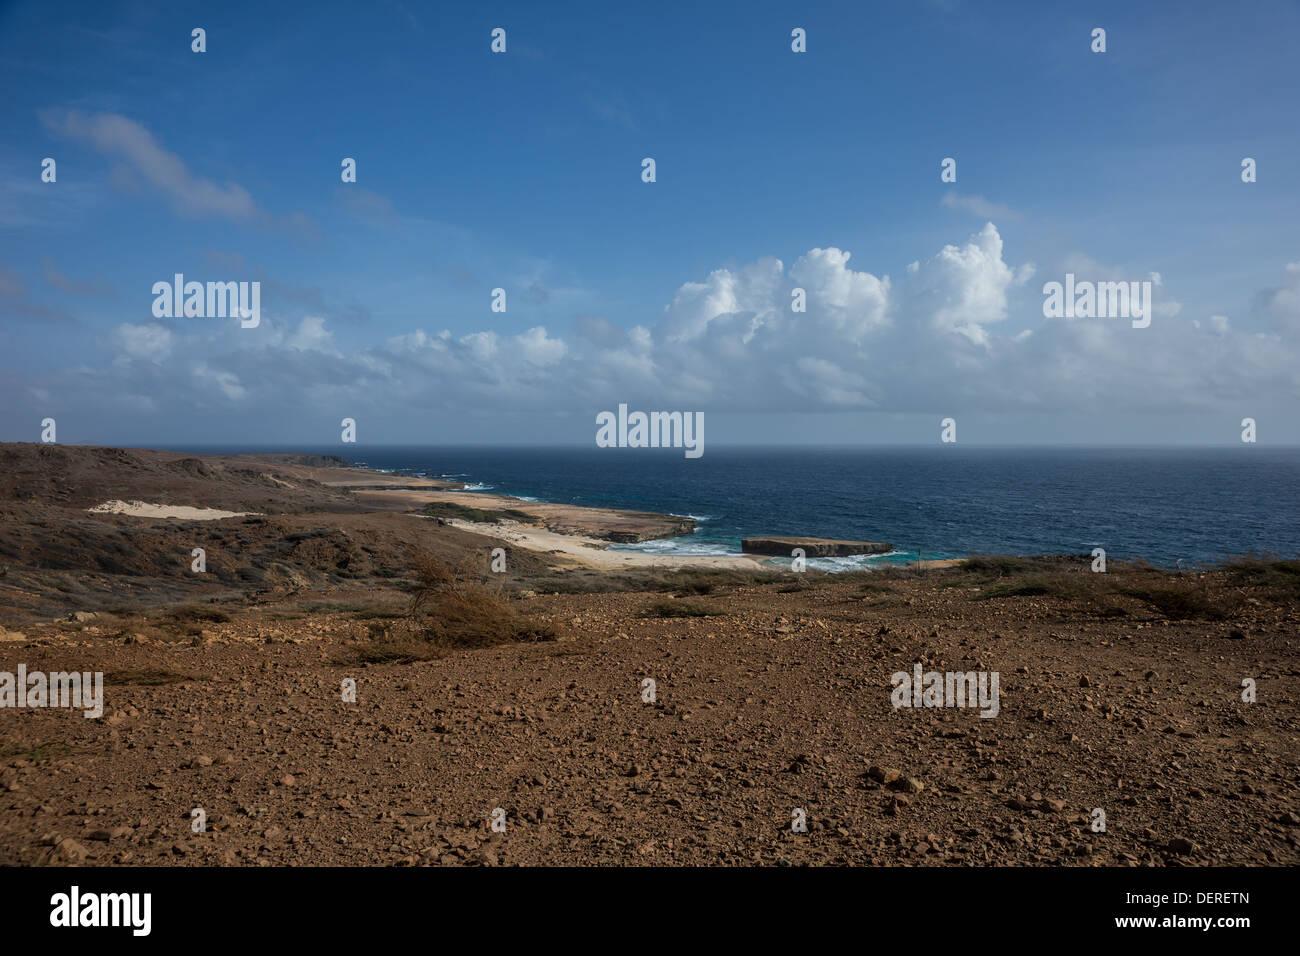 Aruba northeast desert coastline - Stock Image